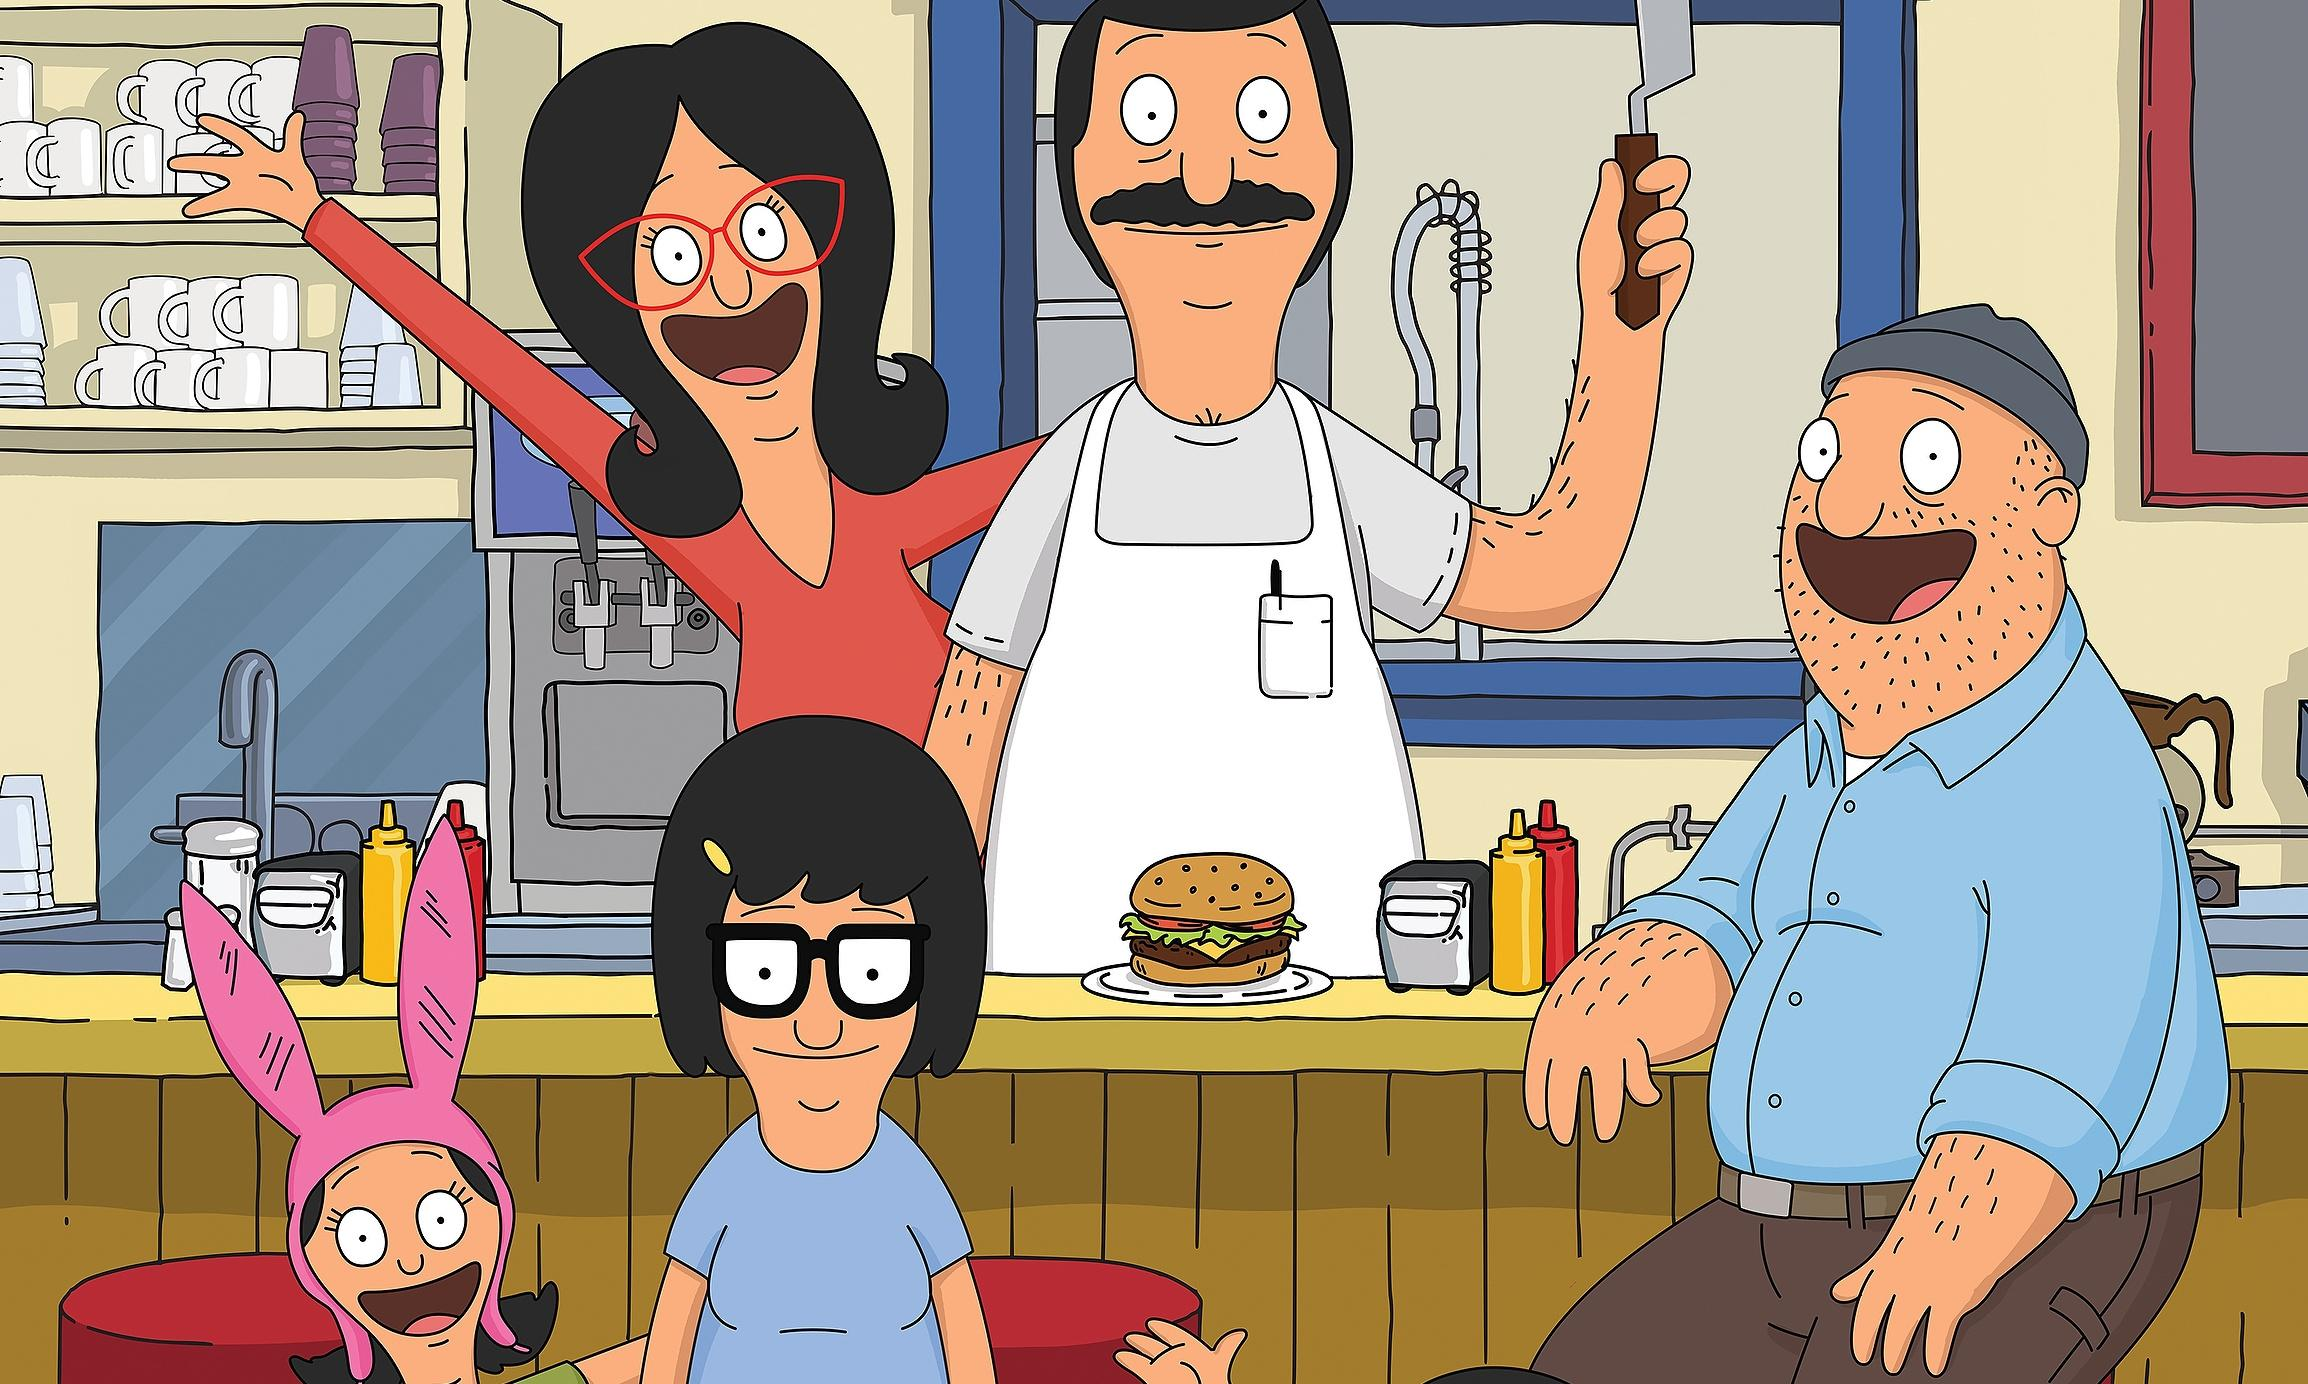 TV tonight: it's flipping chaos as Bob's Burgers returns